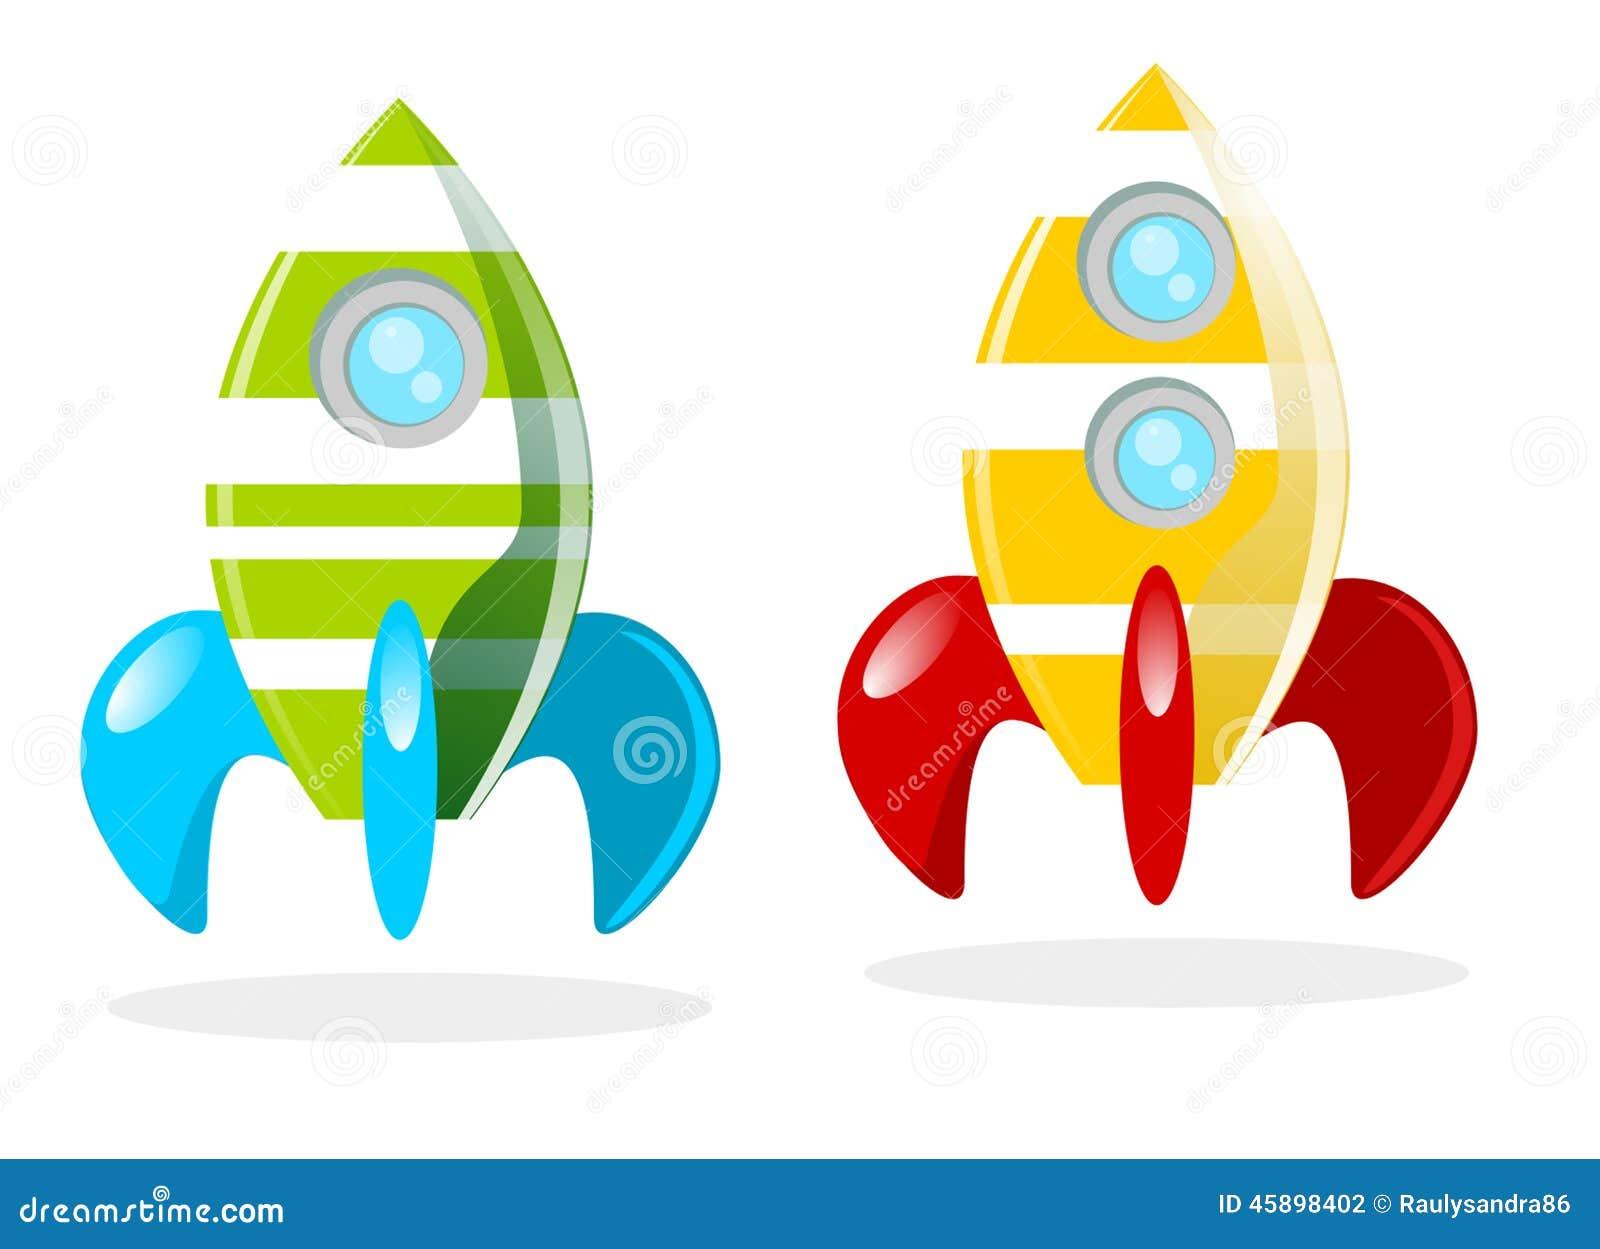 cohetes stock illustration image 45898402 rocket ship clip art free rocket ship clipart printable